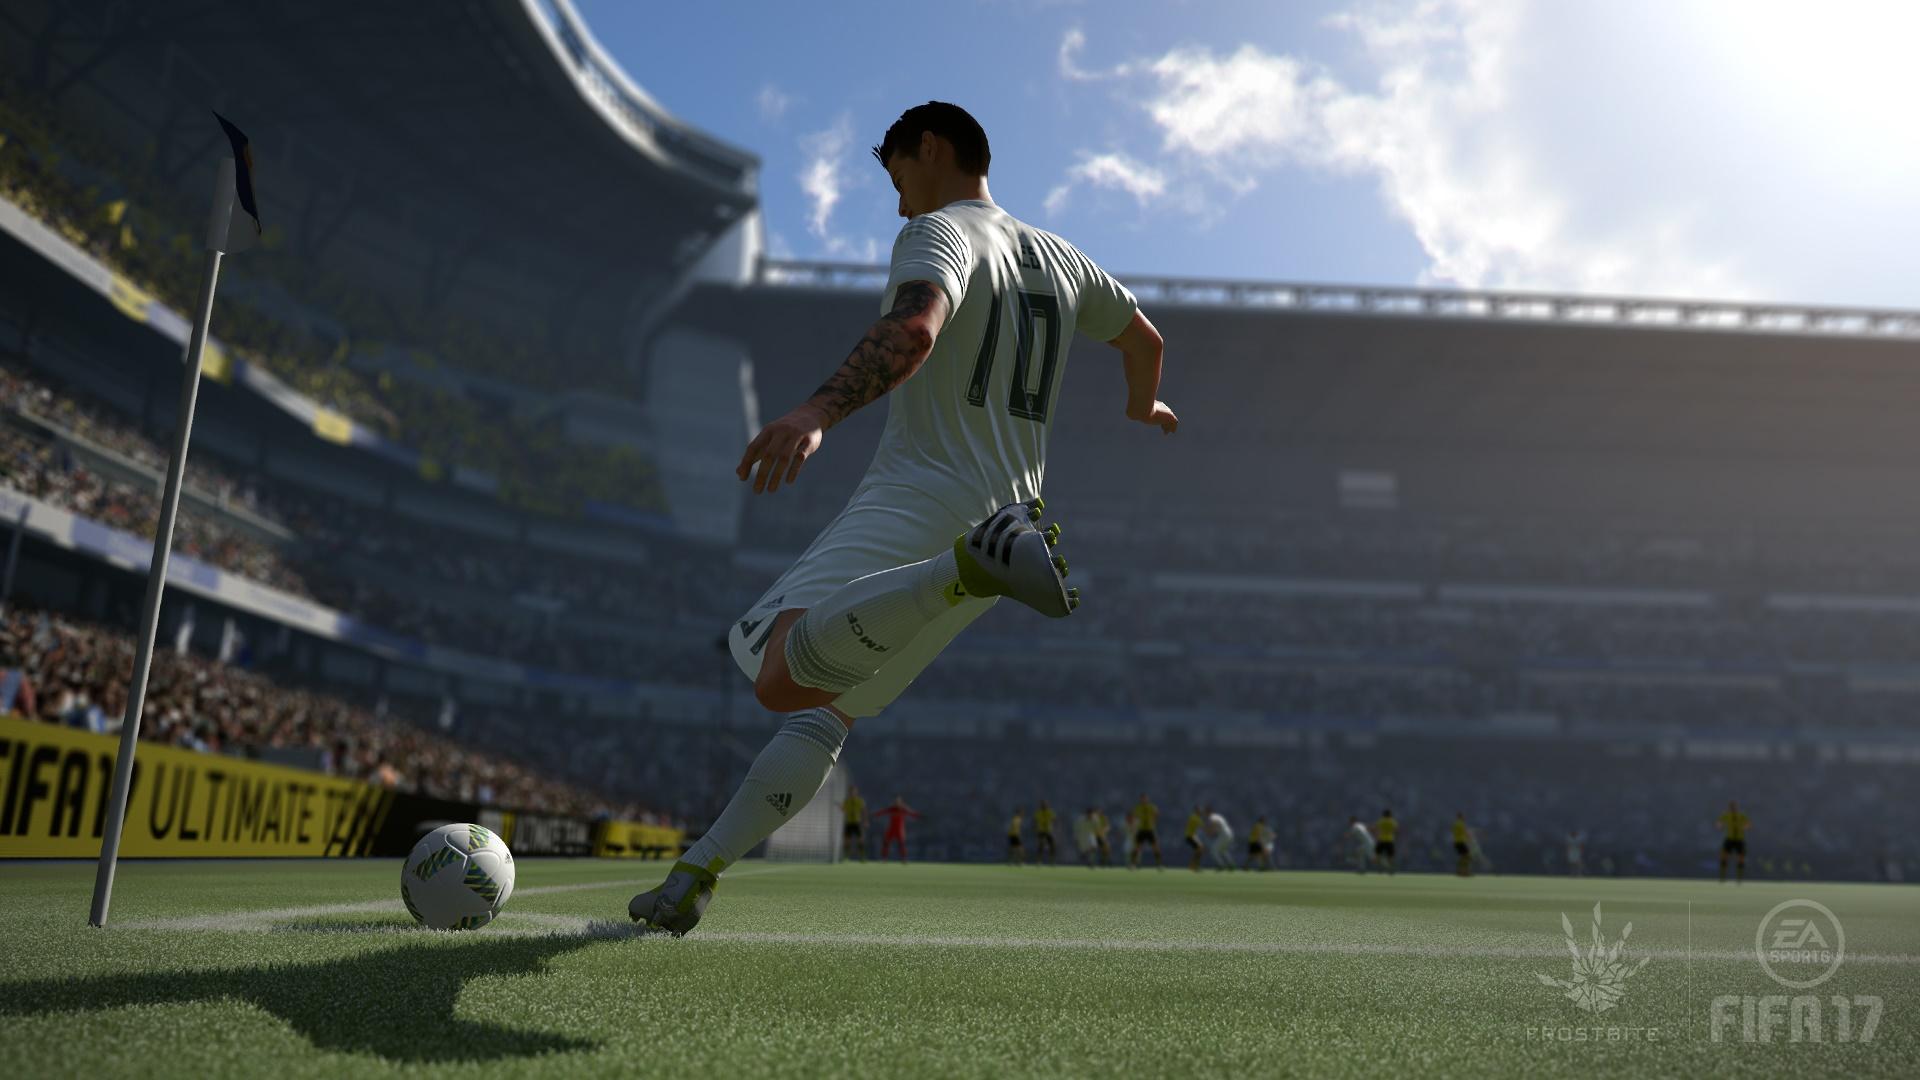 FIFA17_XB1_PS4_EAPLAY_JAMES_CORNER_WM (1)